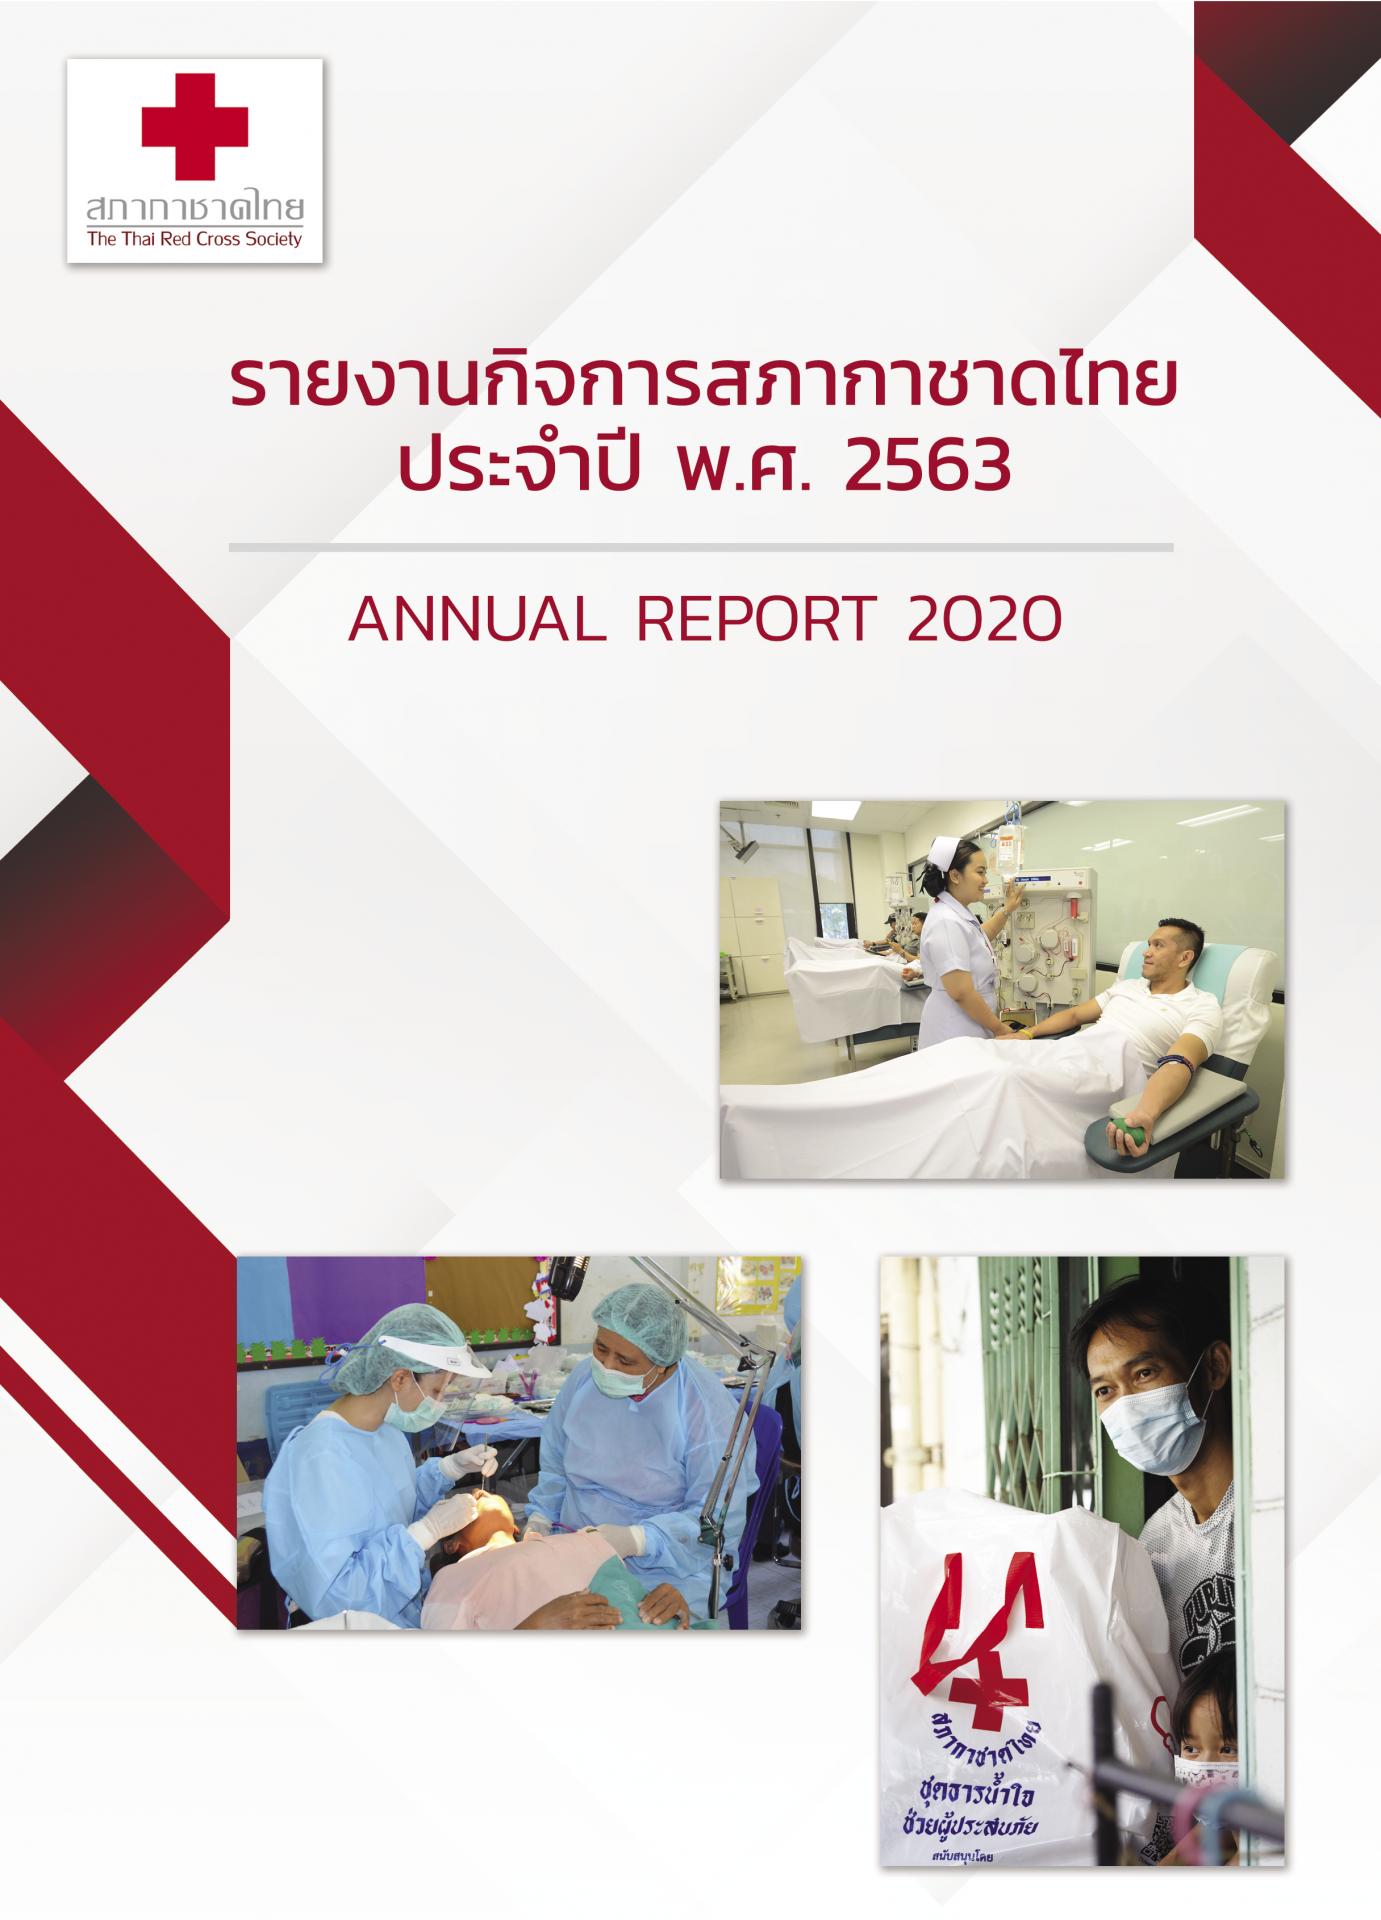 awThai RedCross AnnualReport2020_1single_Page_001